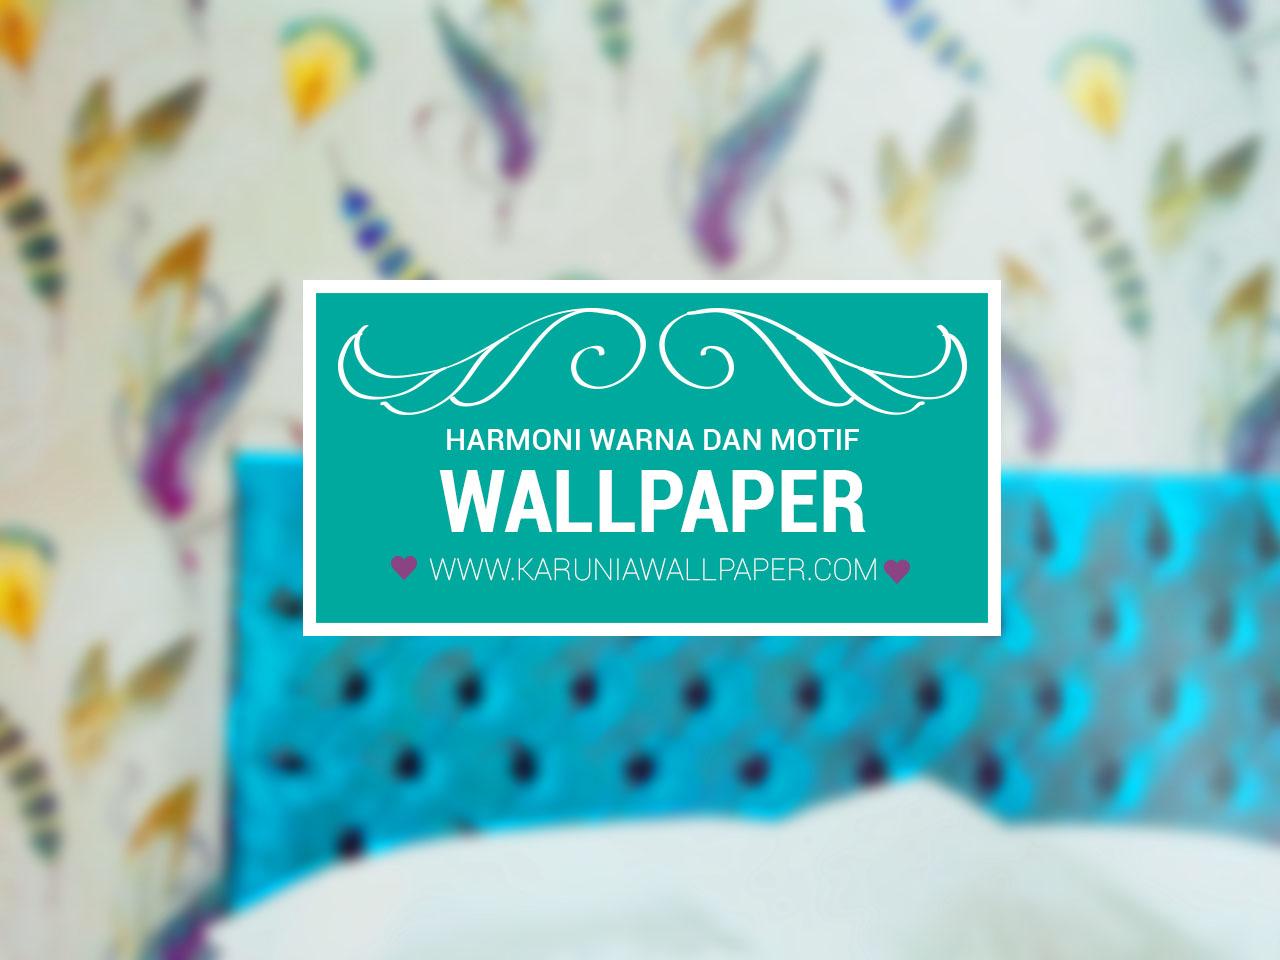 jual wallpaper motif karuniawallpaper baliwerti surabaya